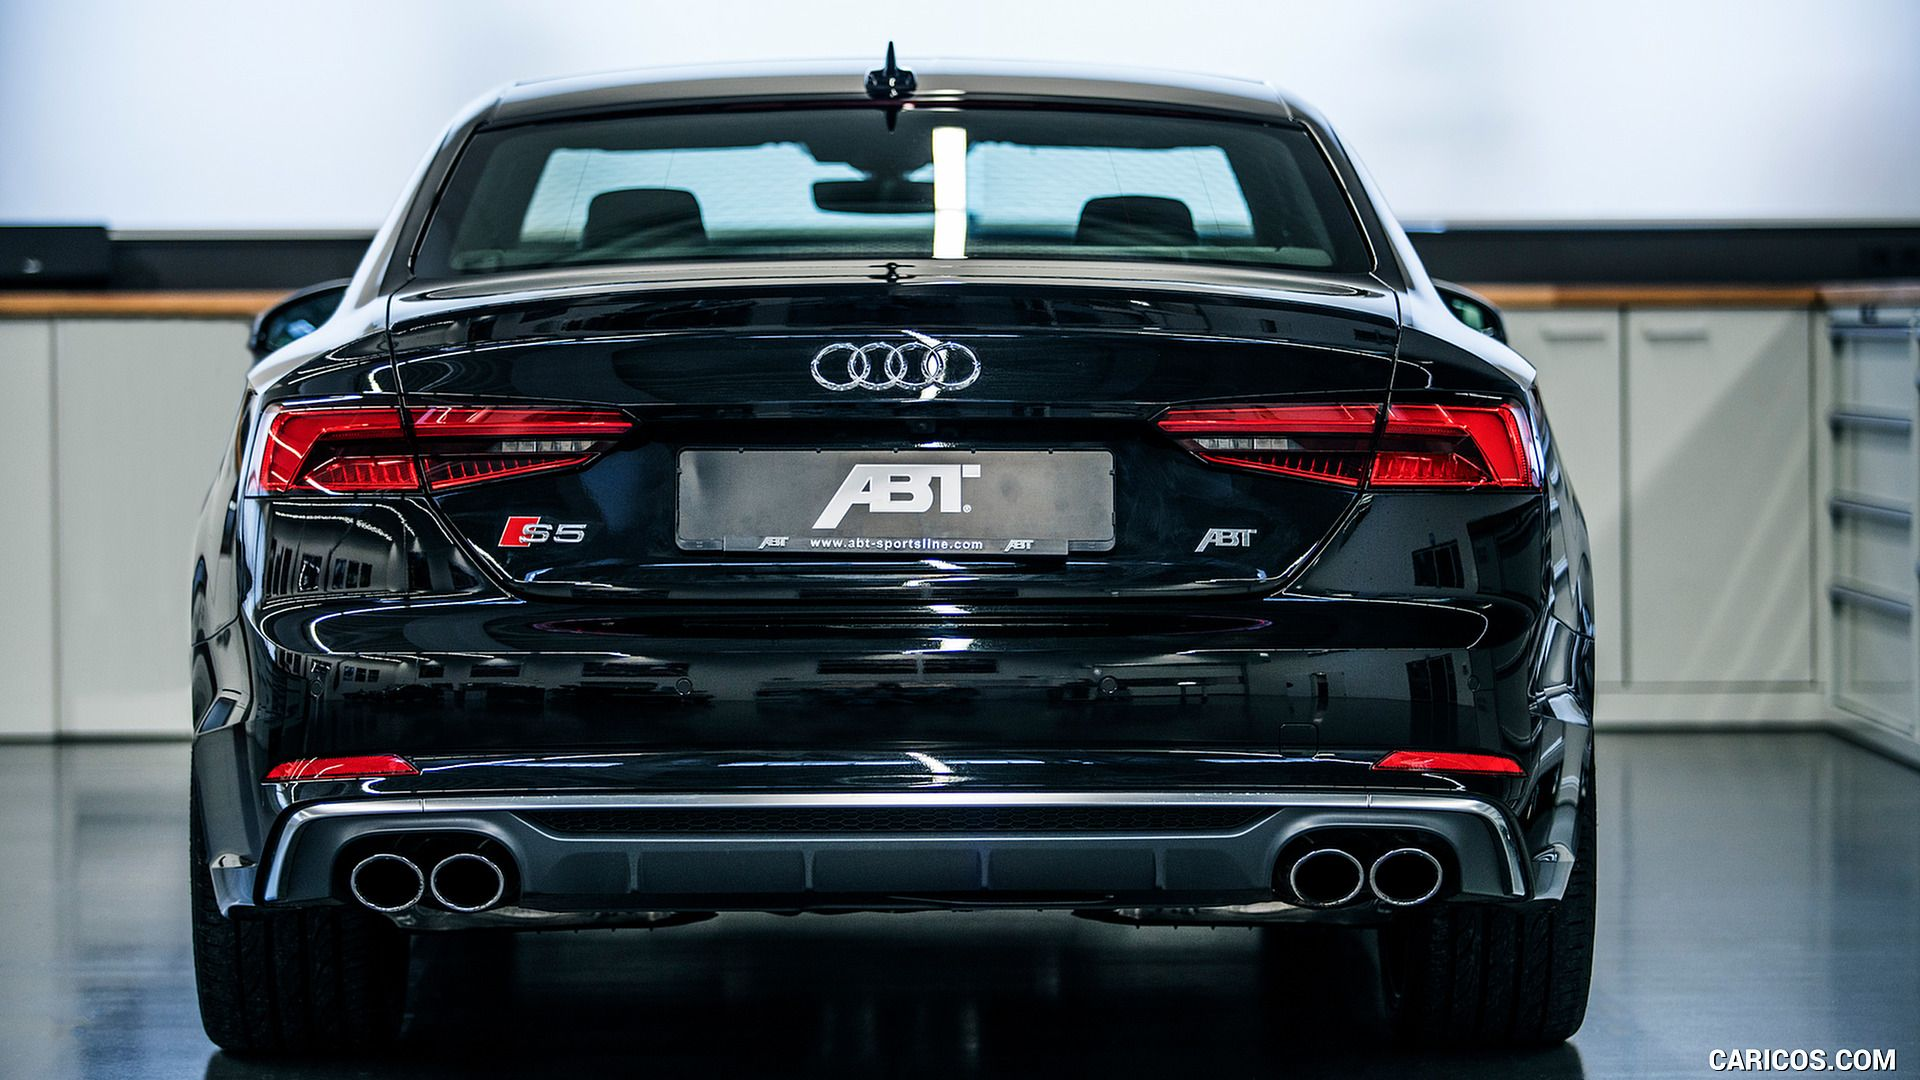 2018 Abt Audi S5 Coupe Wallpaper Audi S5 Audi Audi Cars